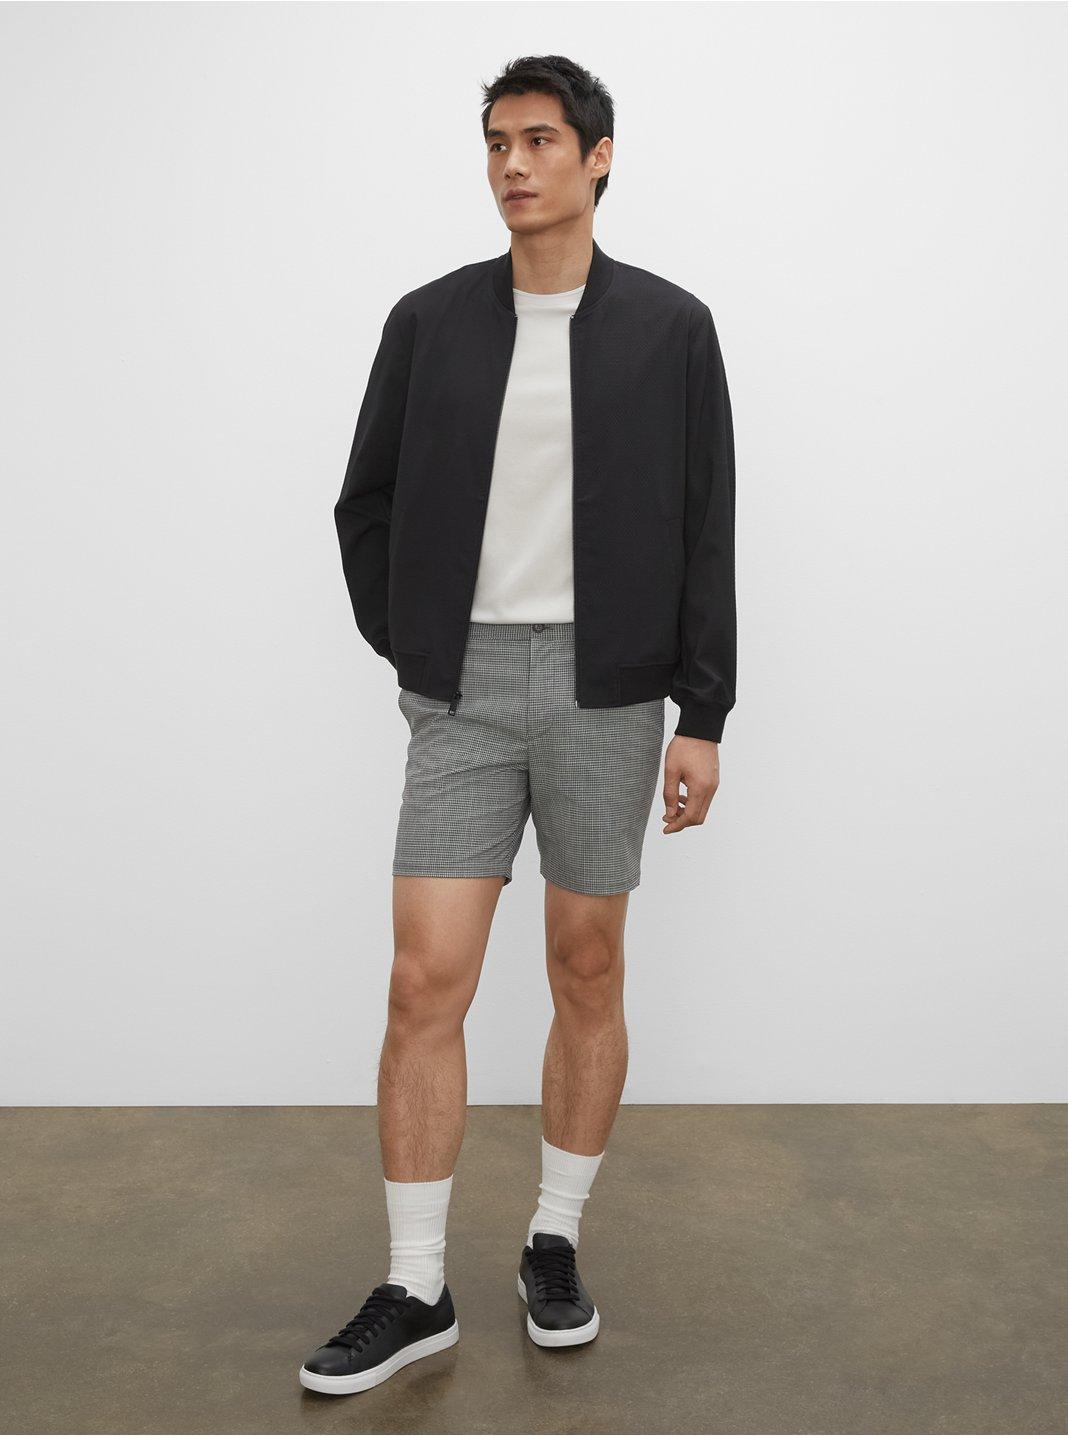 Shorts Baxter 18cm (7po)